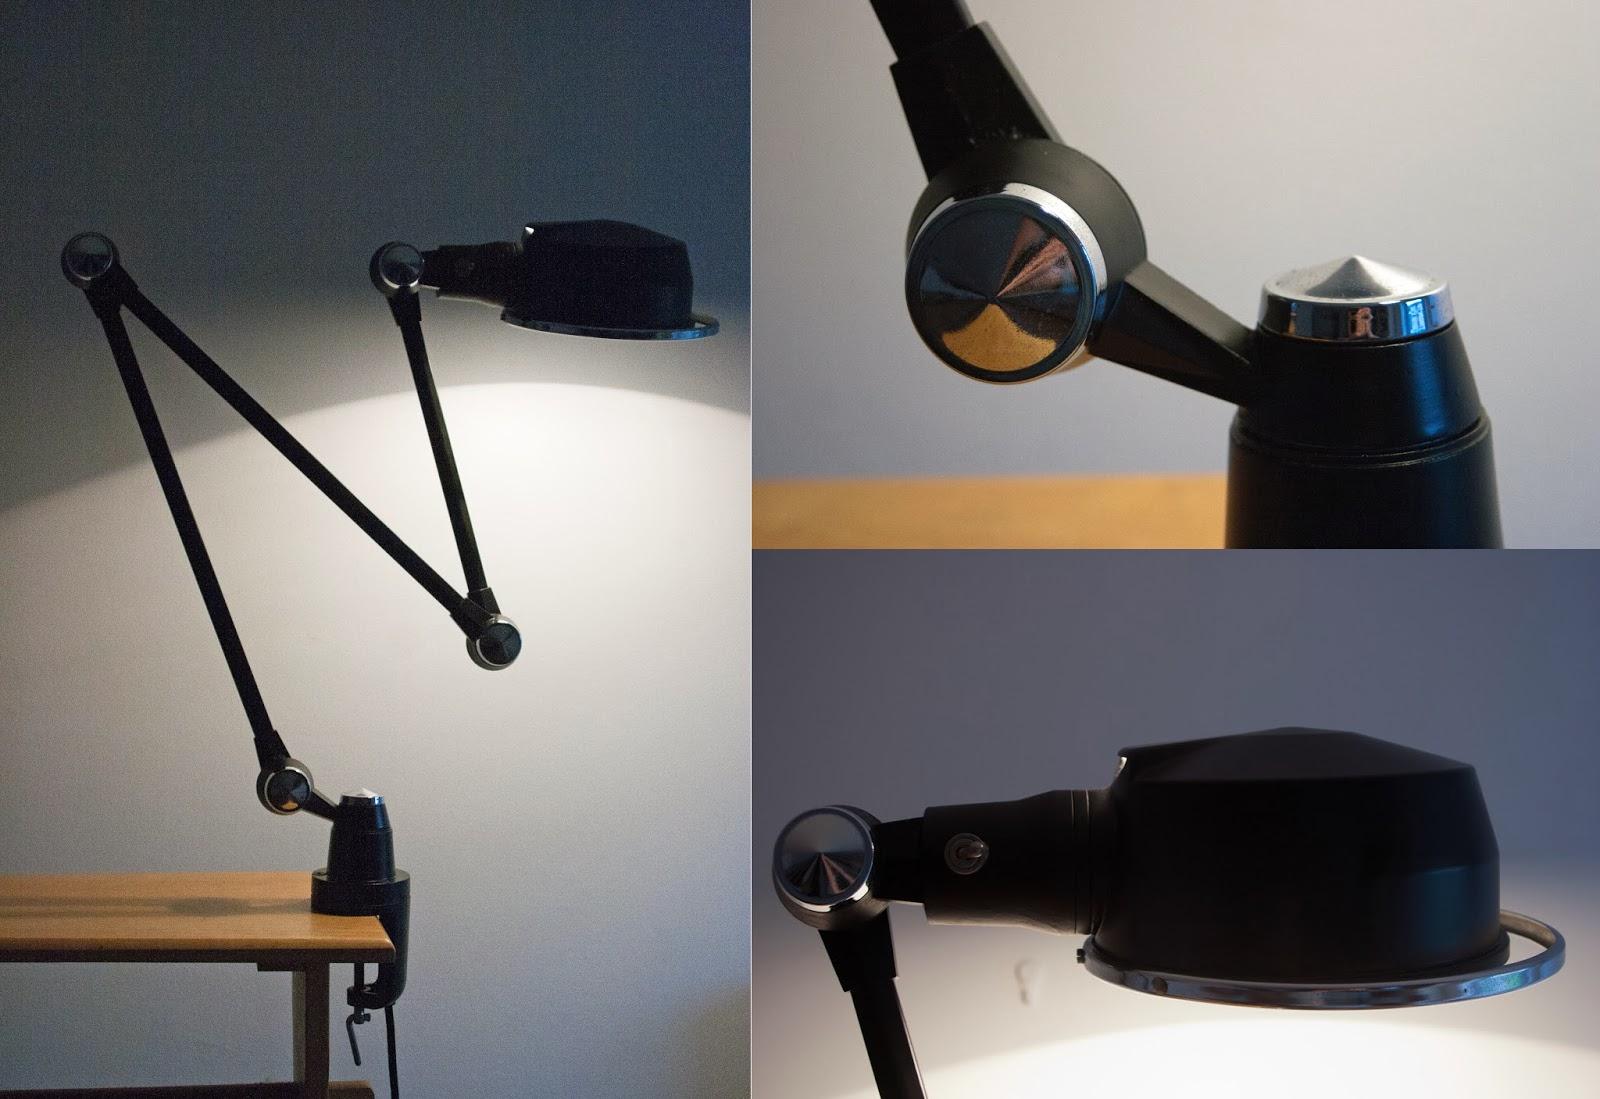 frank b 06 jielde jld lak lacq laq lack black motorcycle series 3 bras sur tau 3 arms. Black Bedroom Furniture Sets. Home Design Ideas